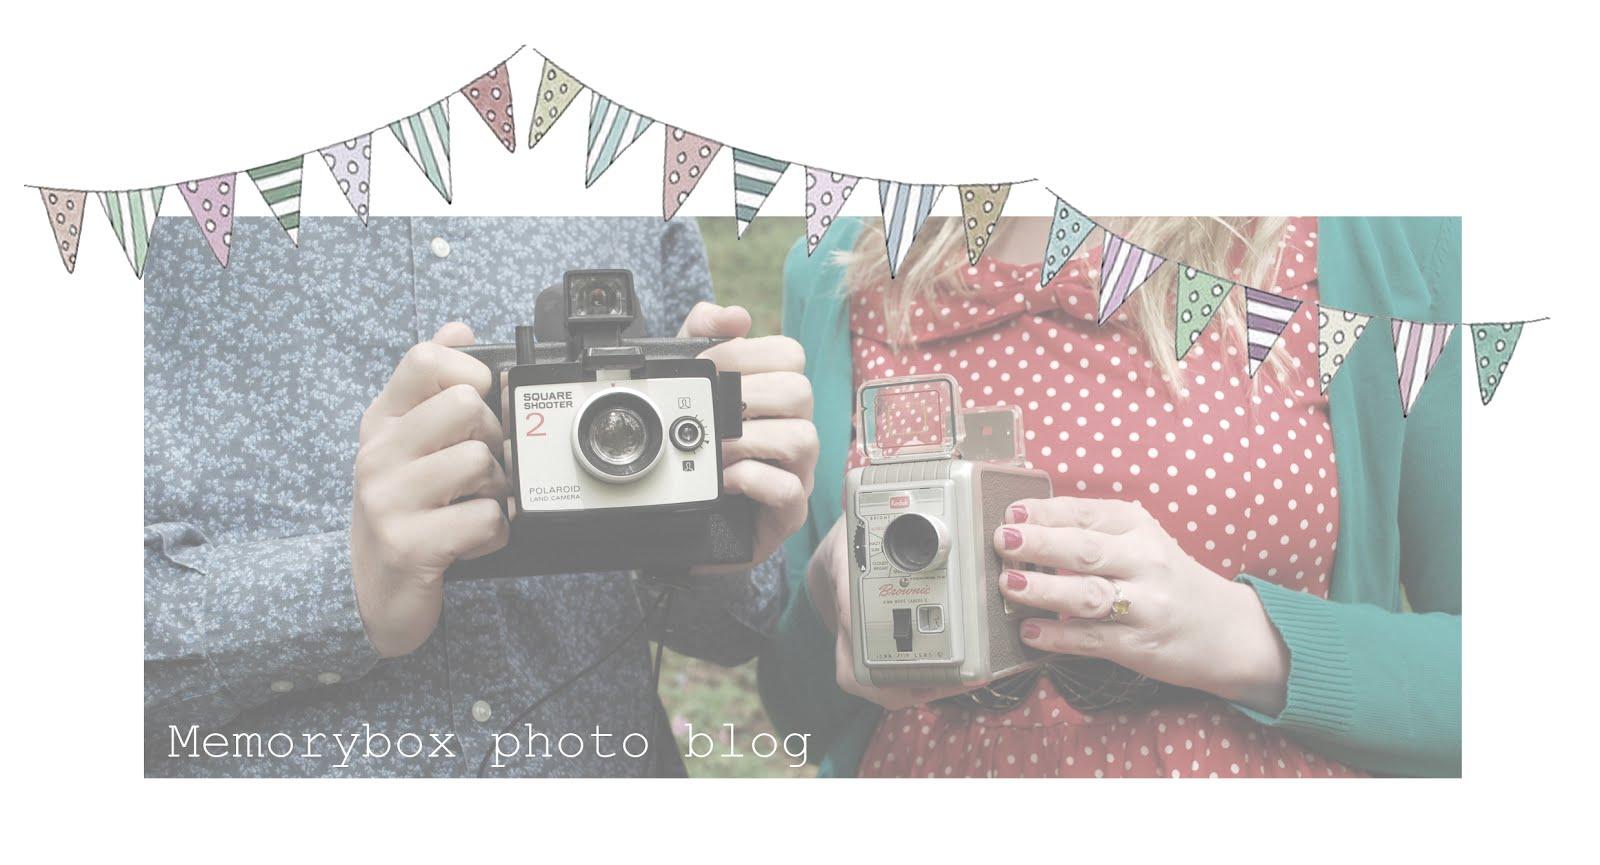 Memorybox photo blog